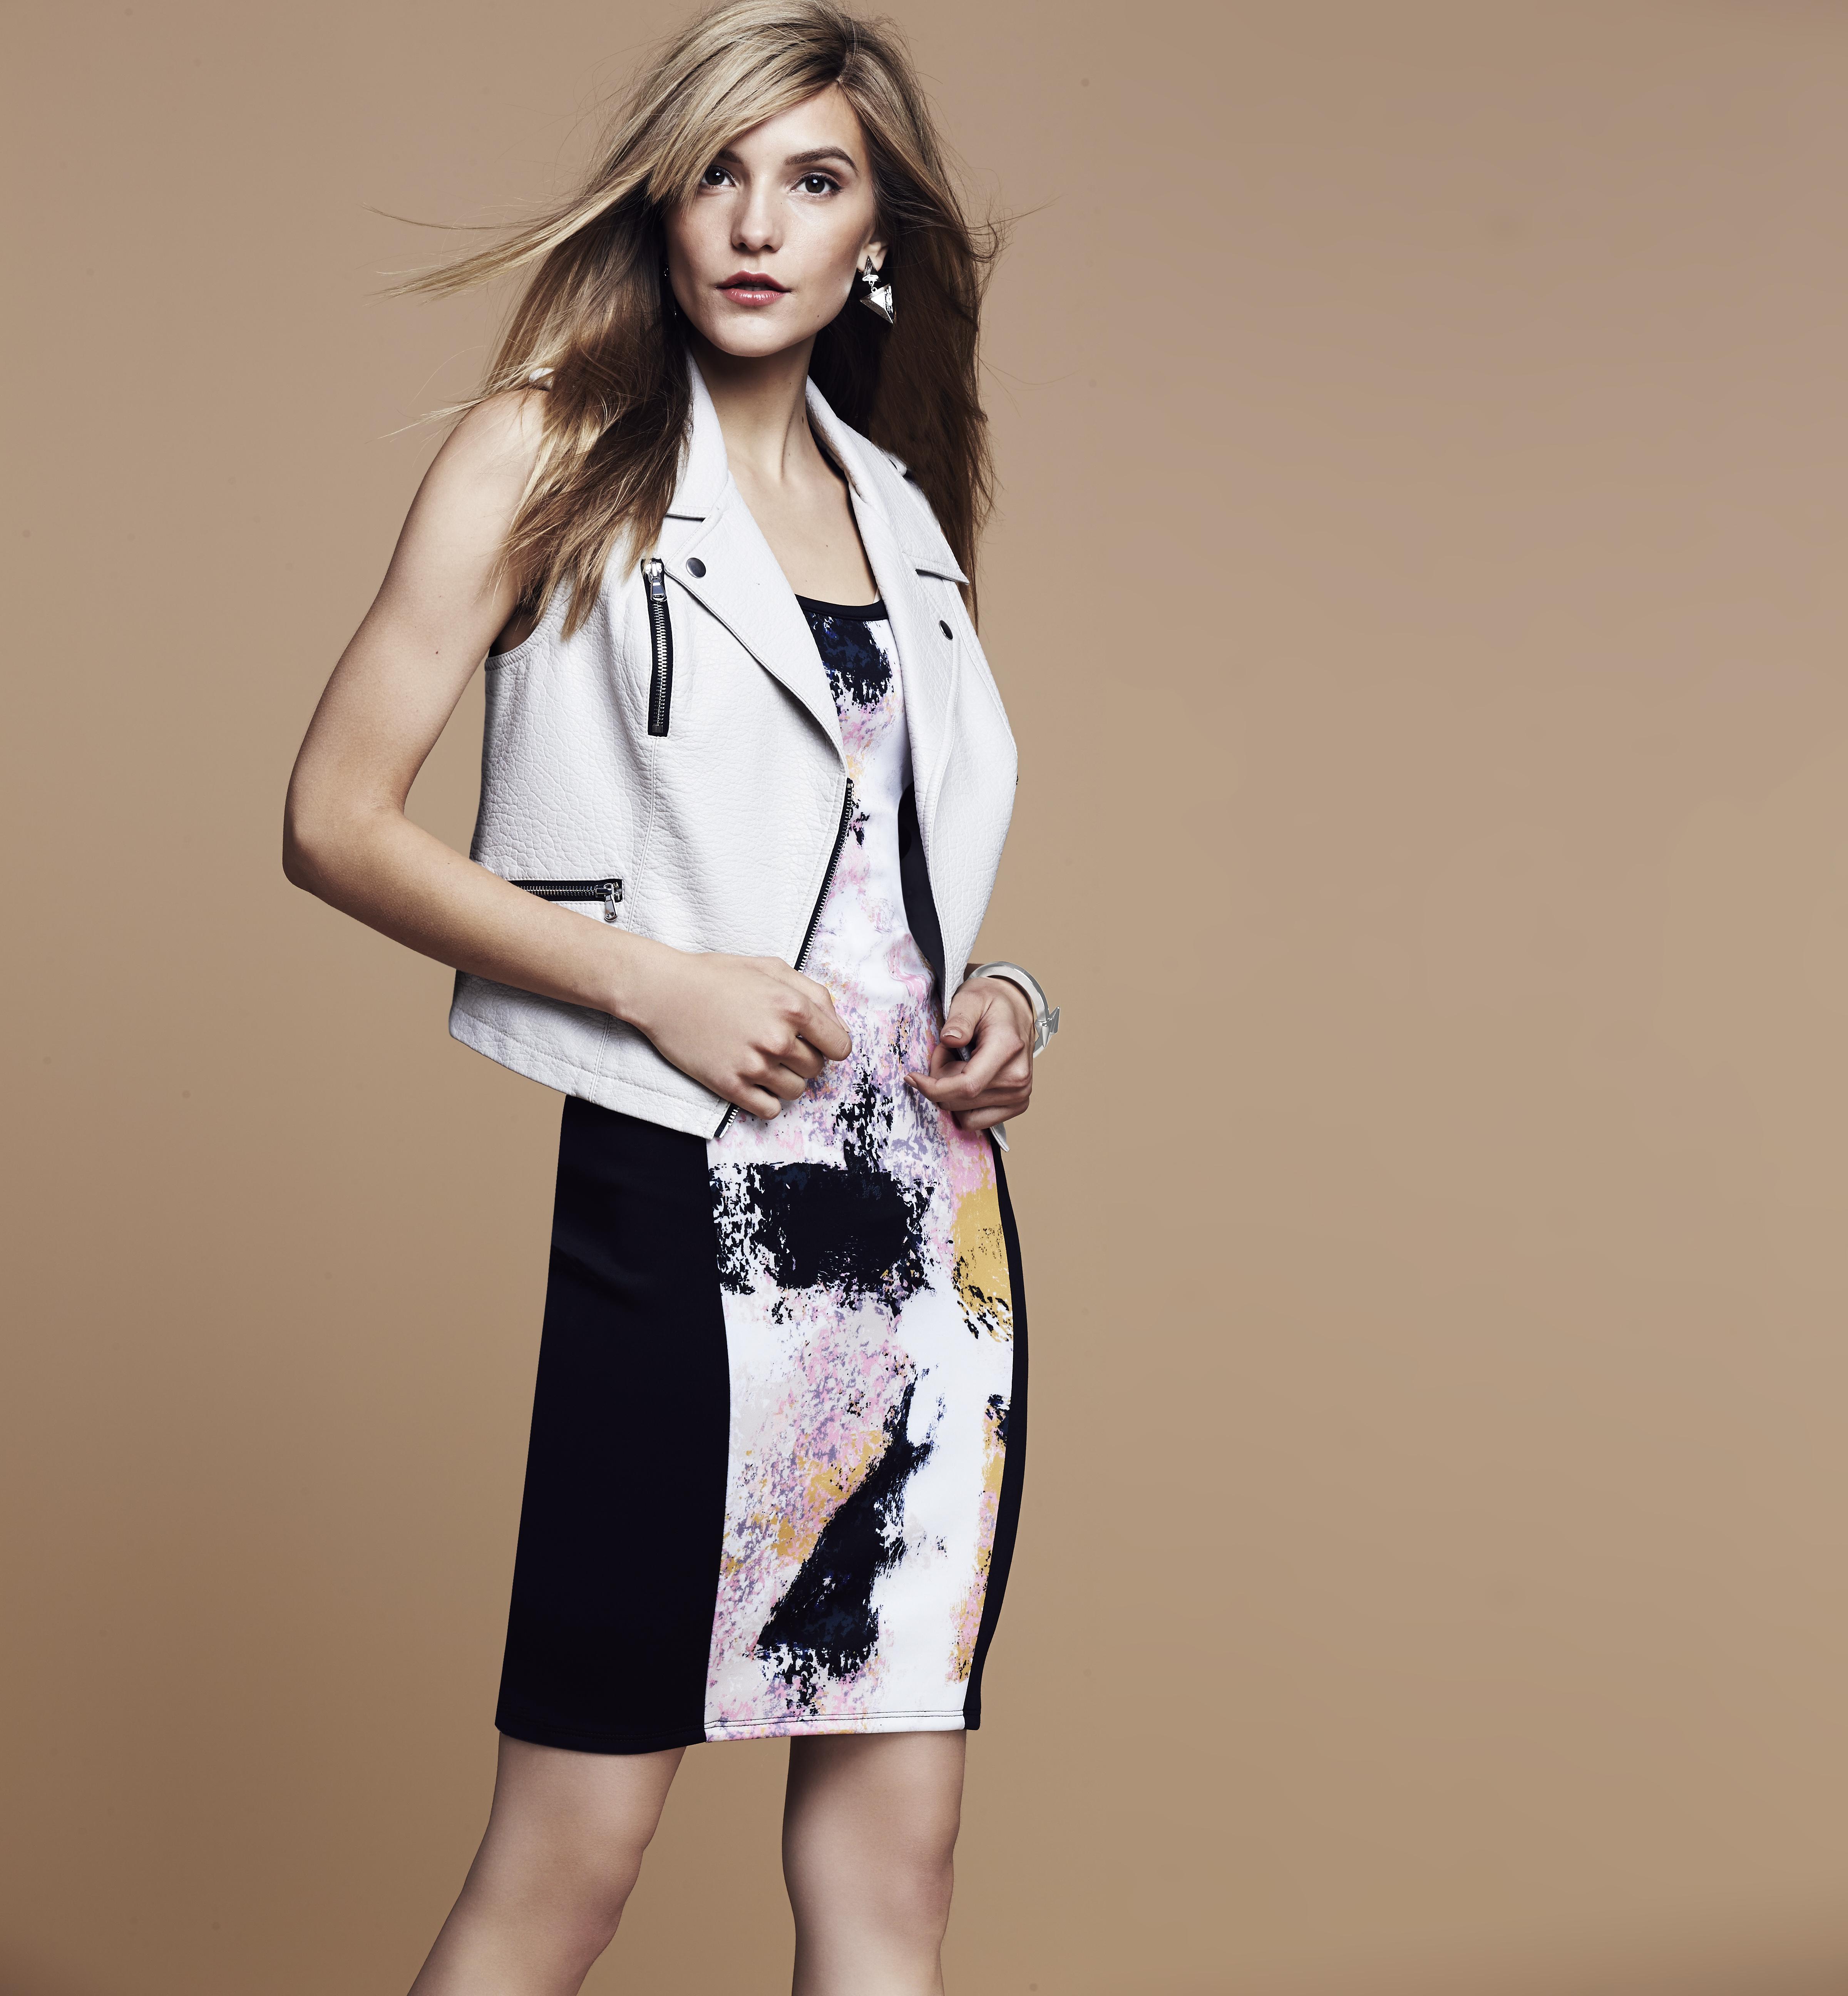 Macys-Spring-Fashion